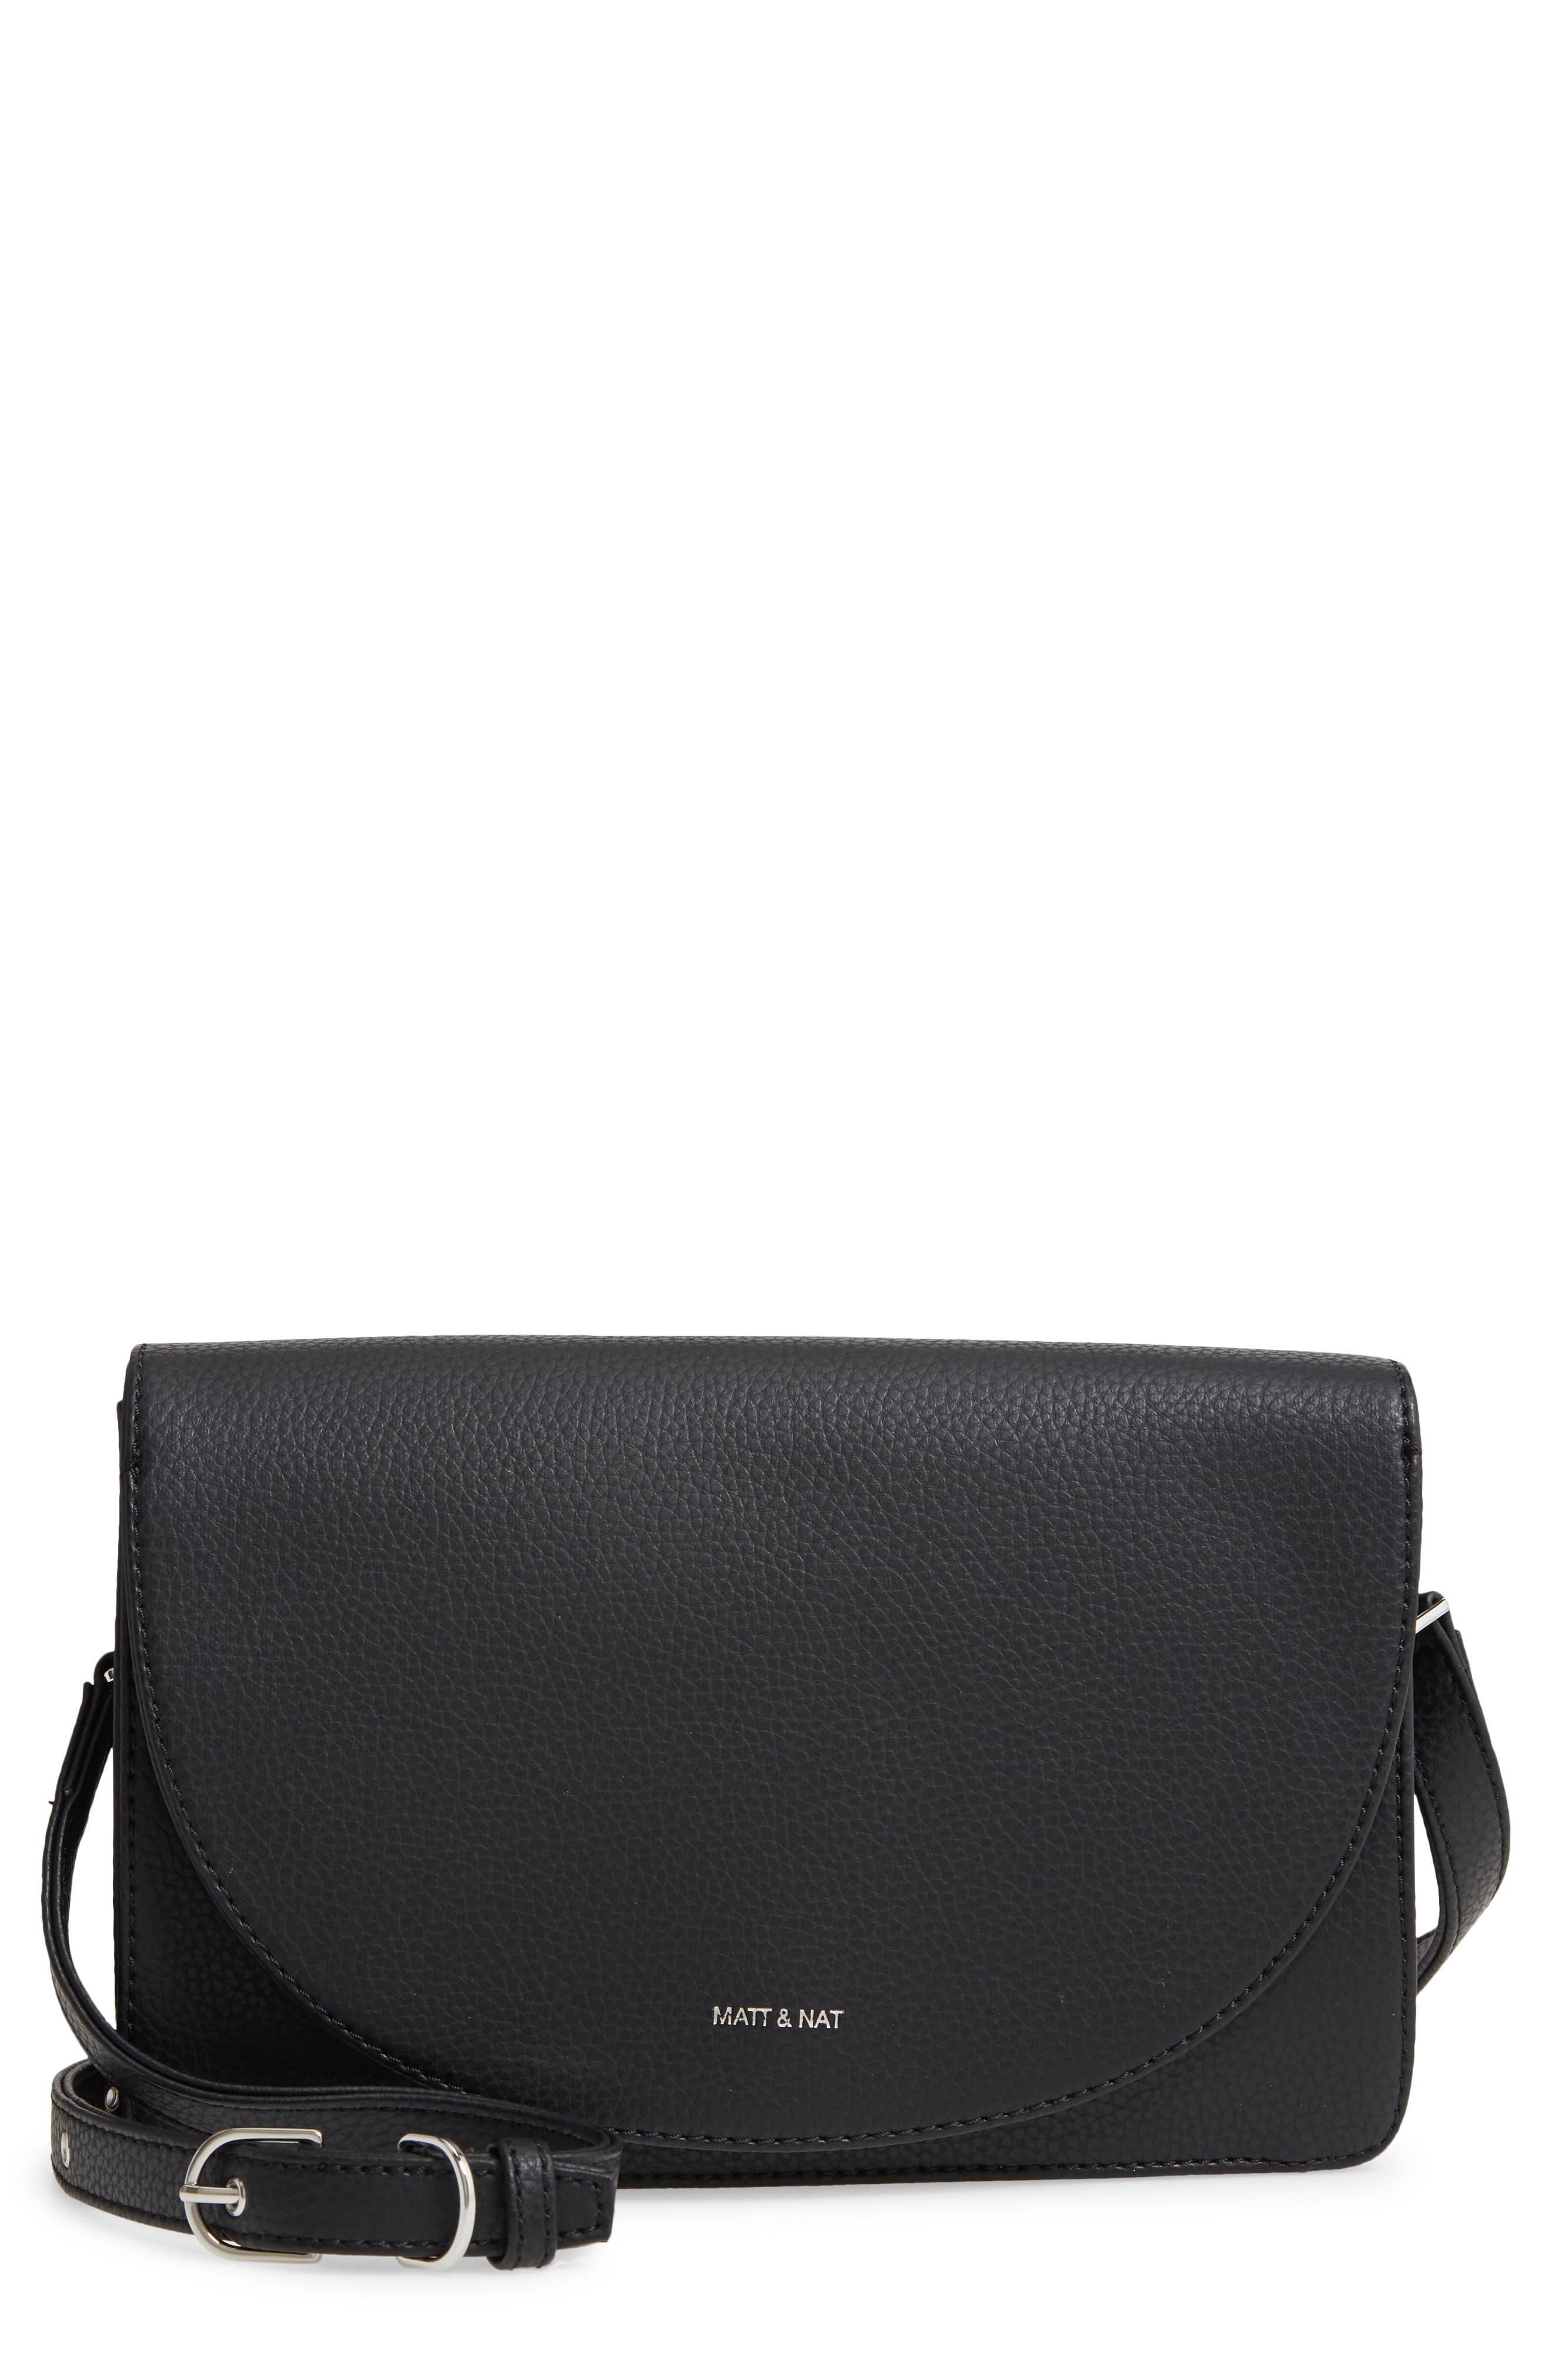 Purity Sofi Water Resistant Vegan Leather Crossbody Bag